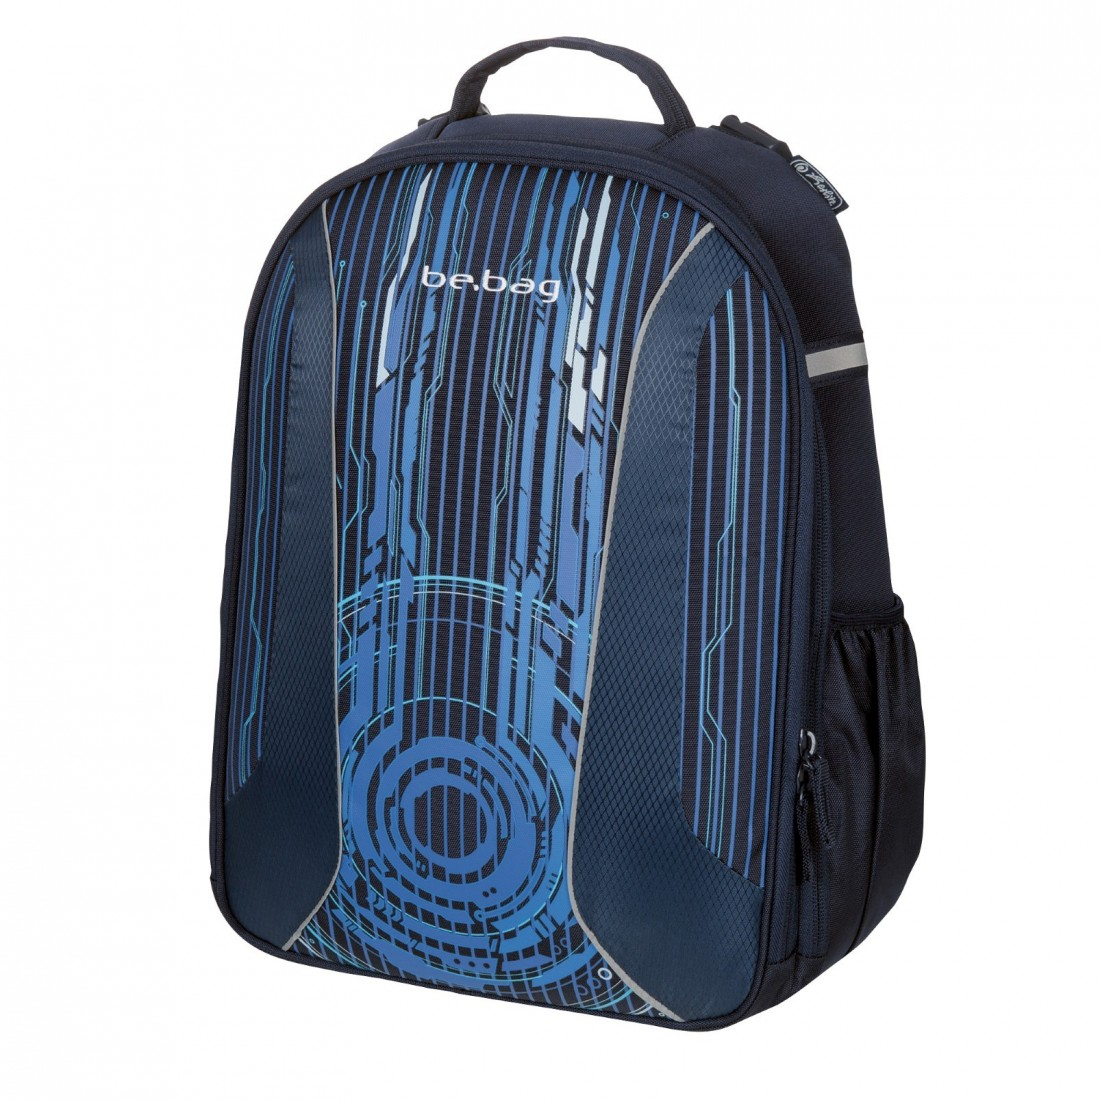 PLECAK be.bag AIRGO SPACESHIP Kosmos - plecak-tornister.pl